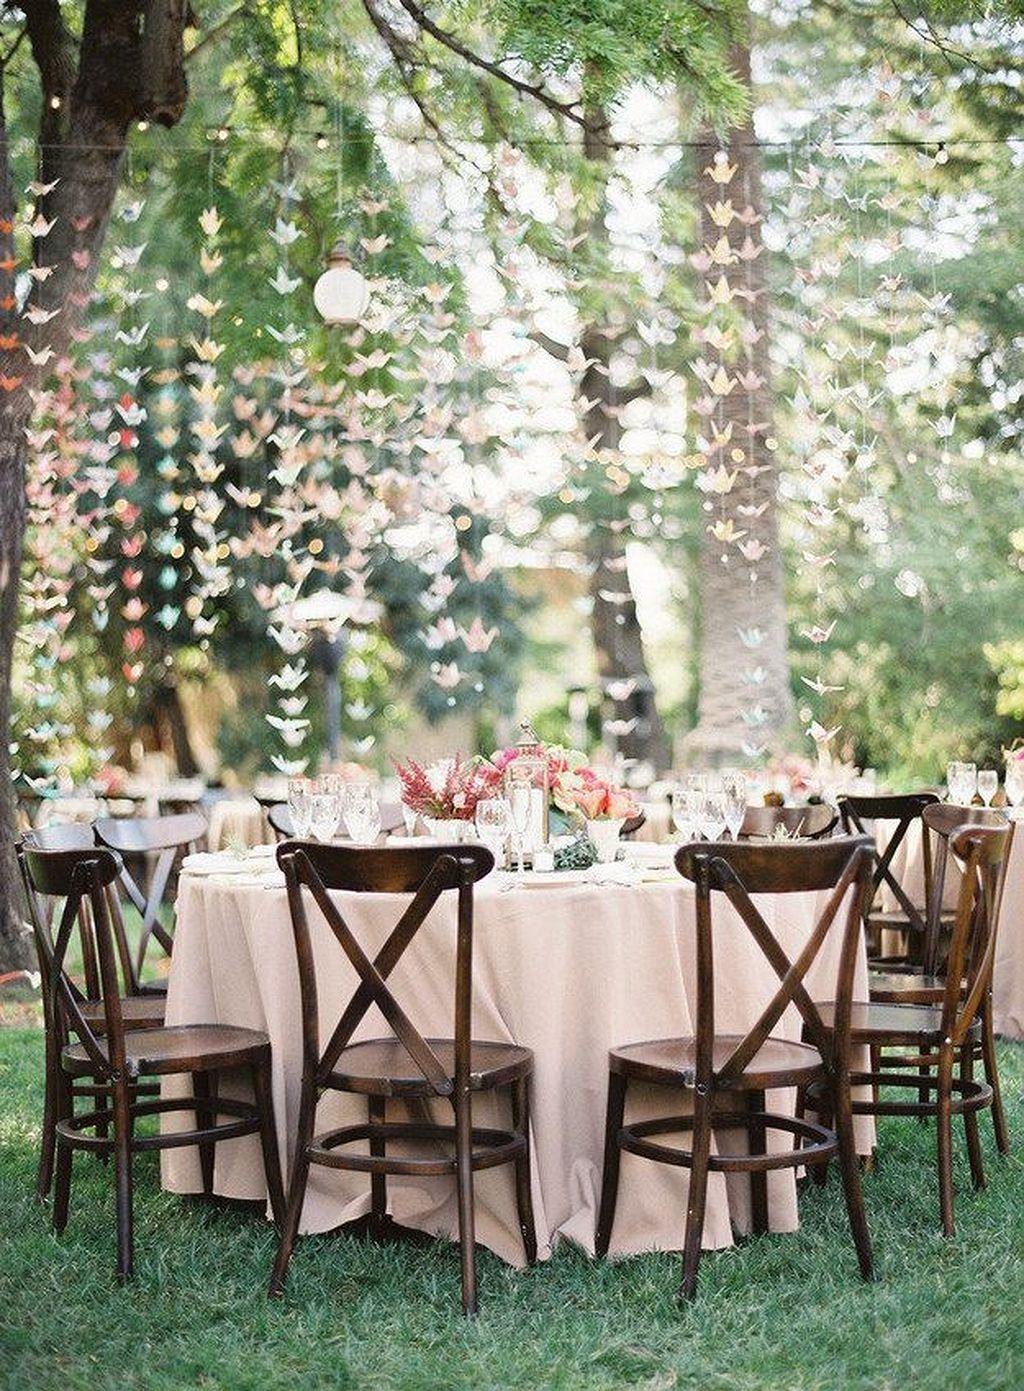 60 Outdoor Wedding On A Budget Ideas